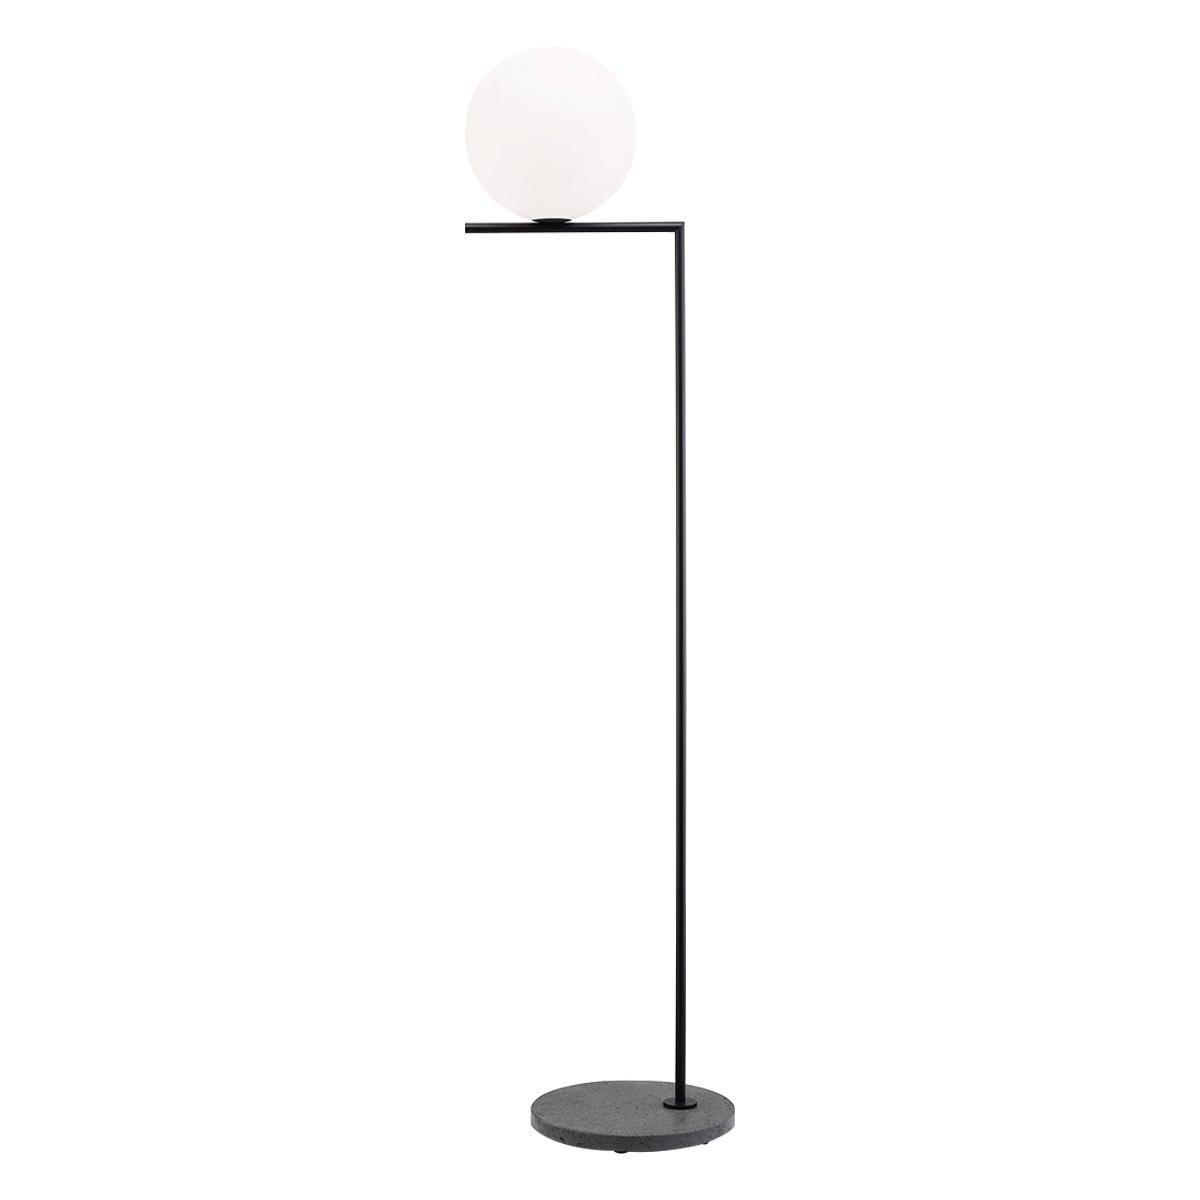 Flos IC Lights F2 Outdoor Floor Lamp by Michael Anastassiades